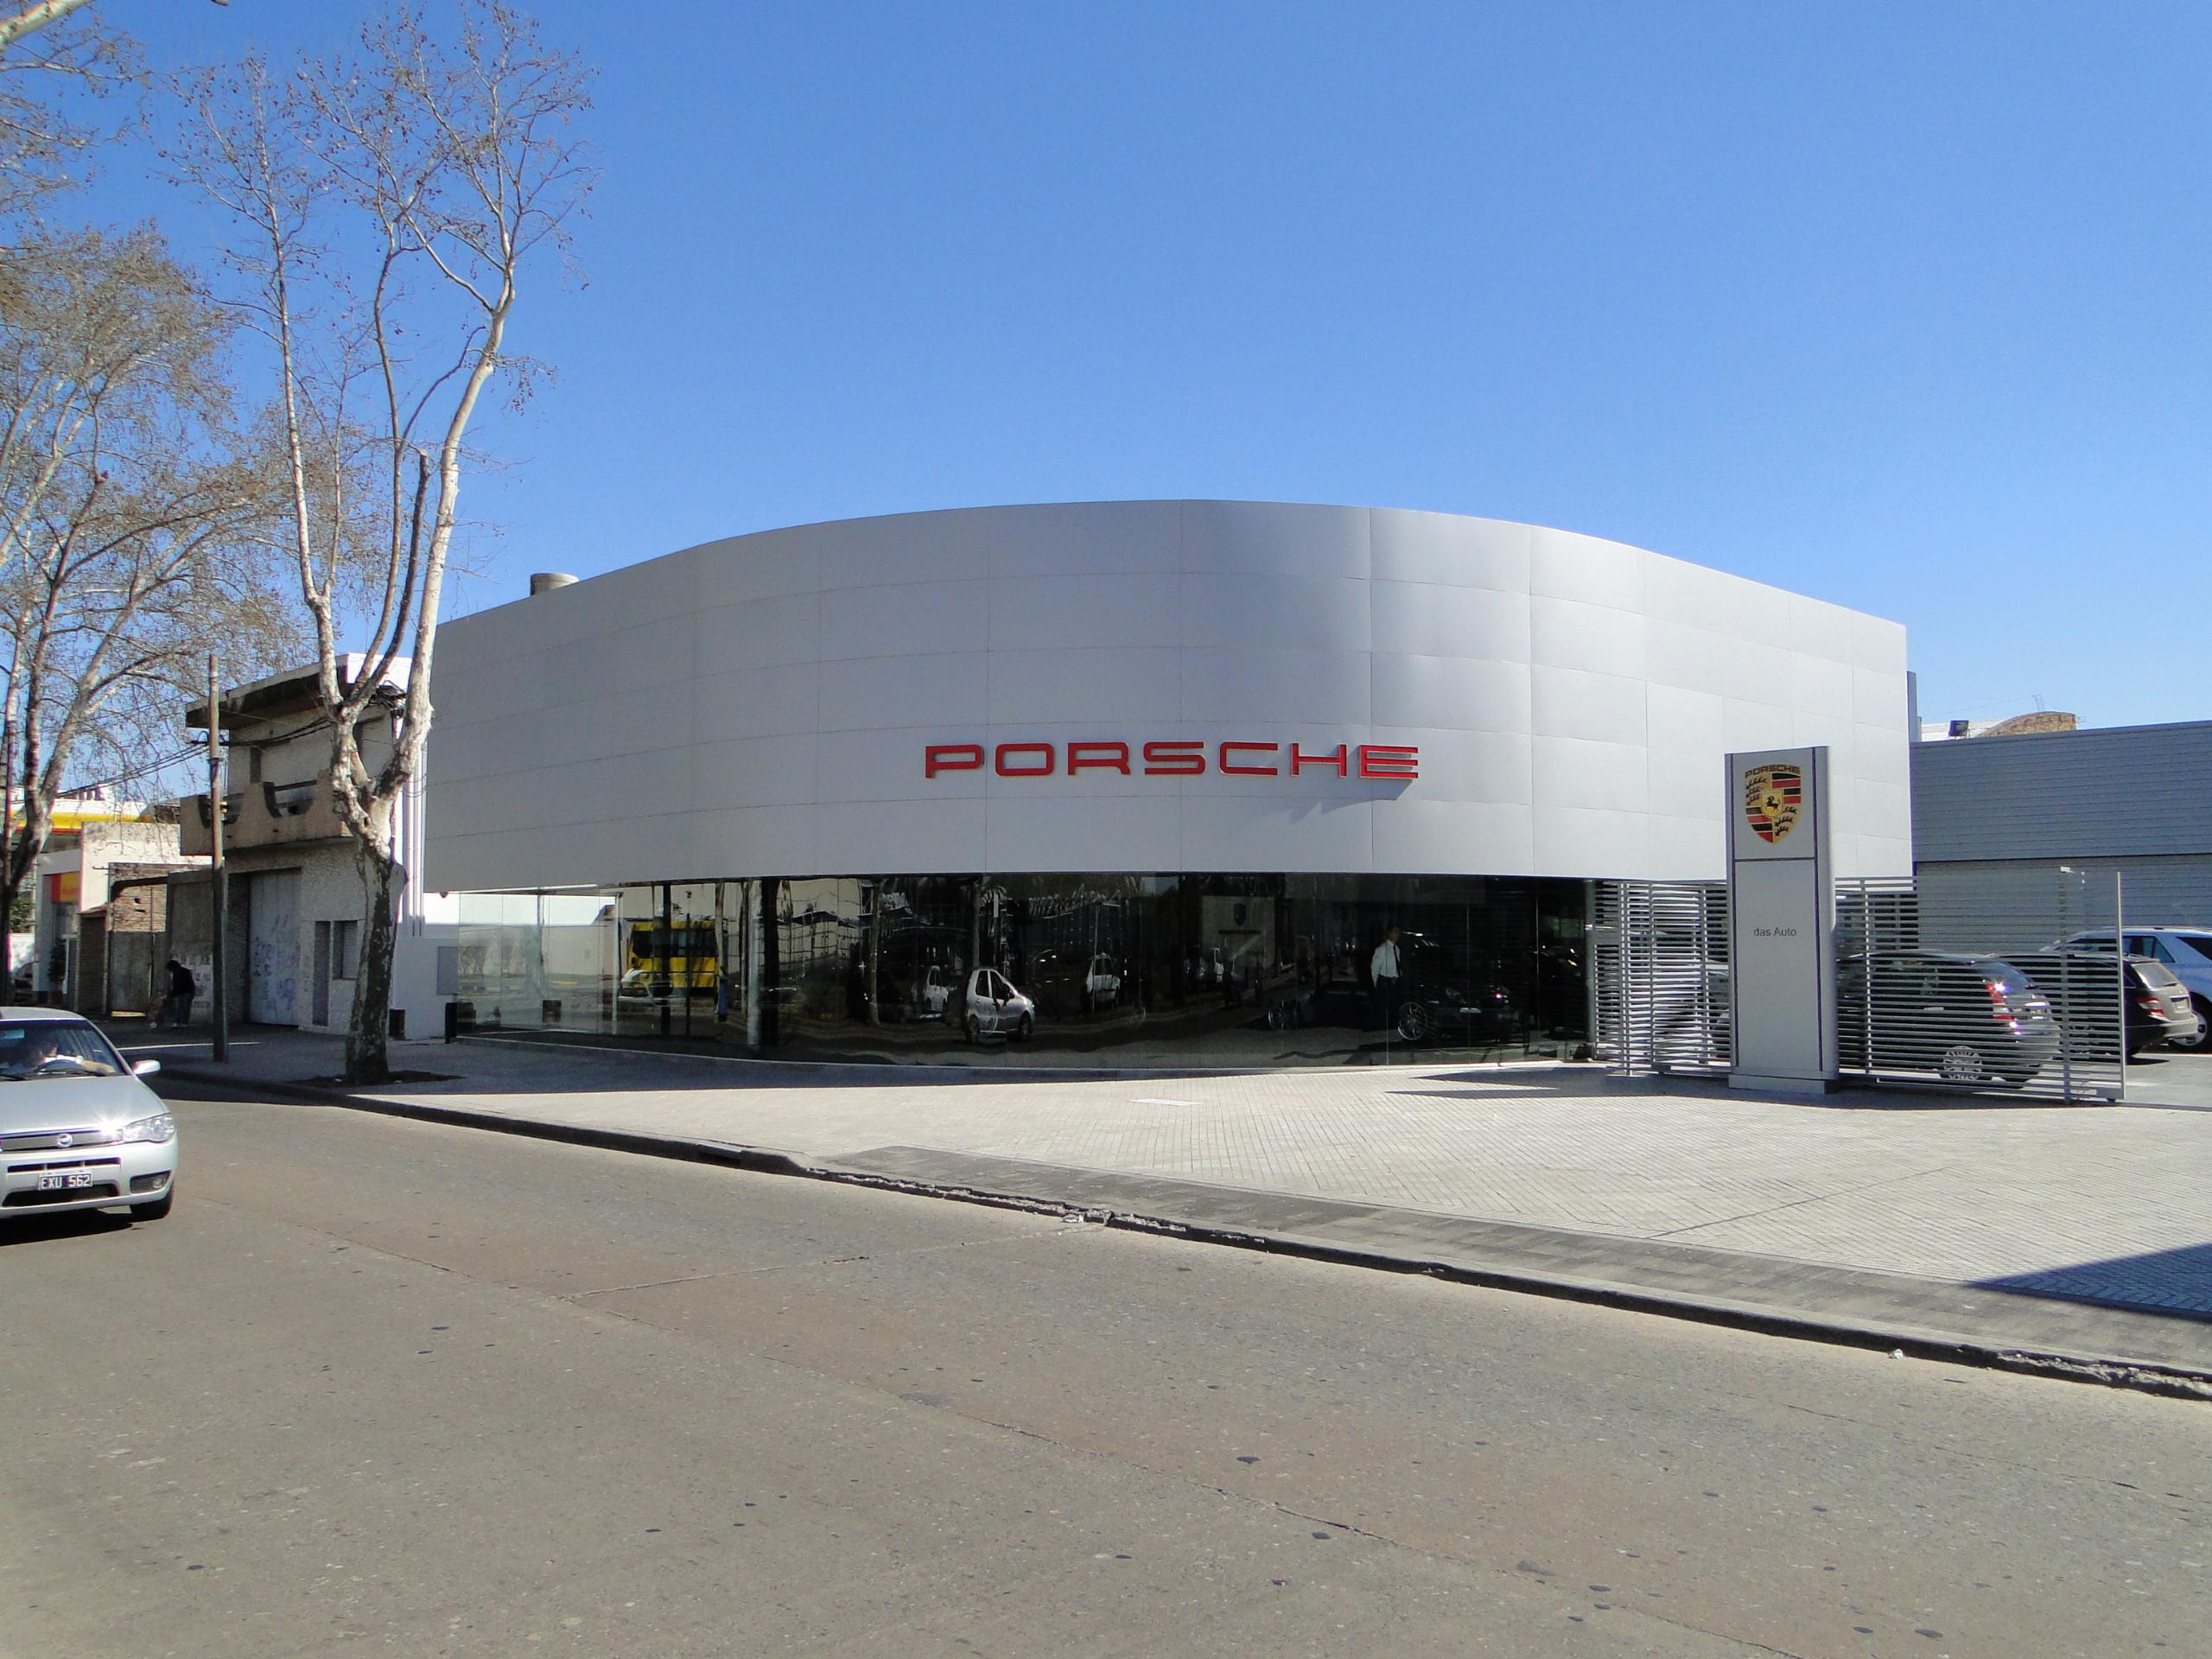 Concesionaria Porsche en Rosario